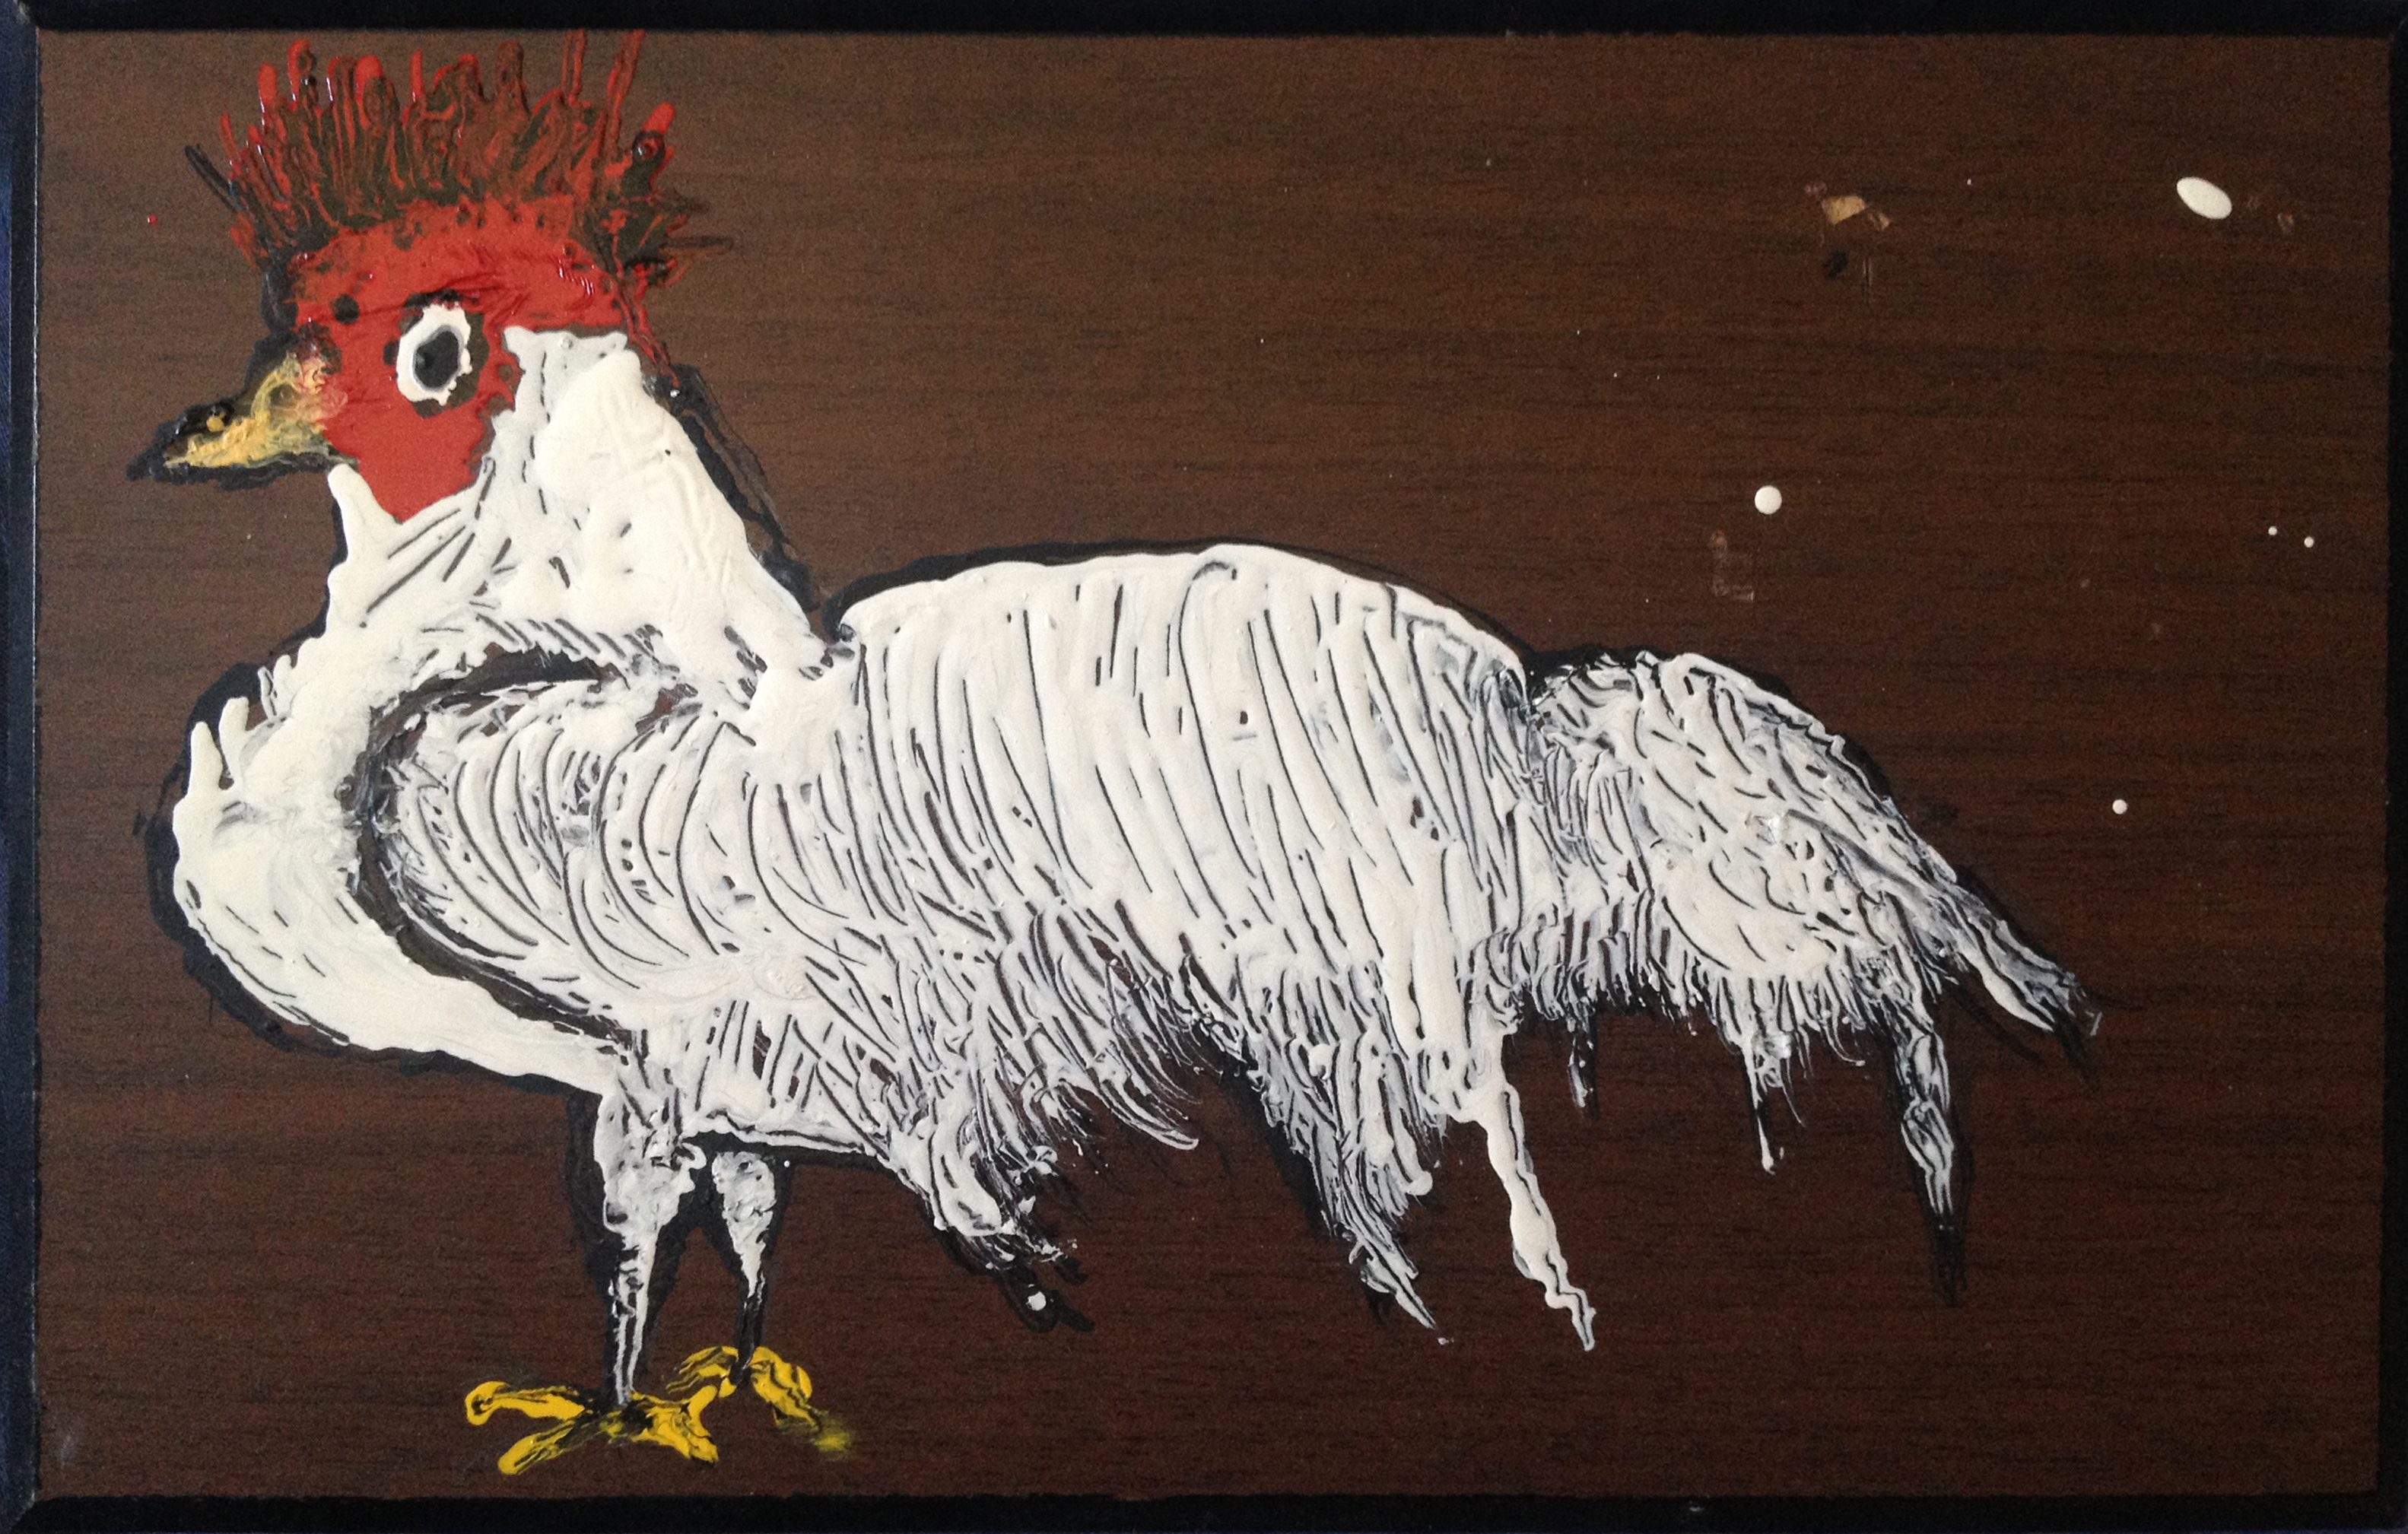 Celeste Chicken